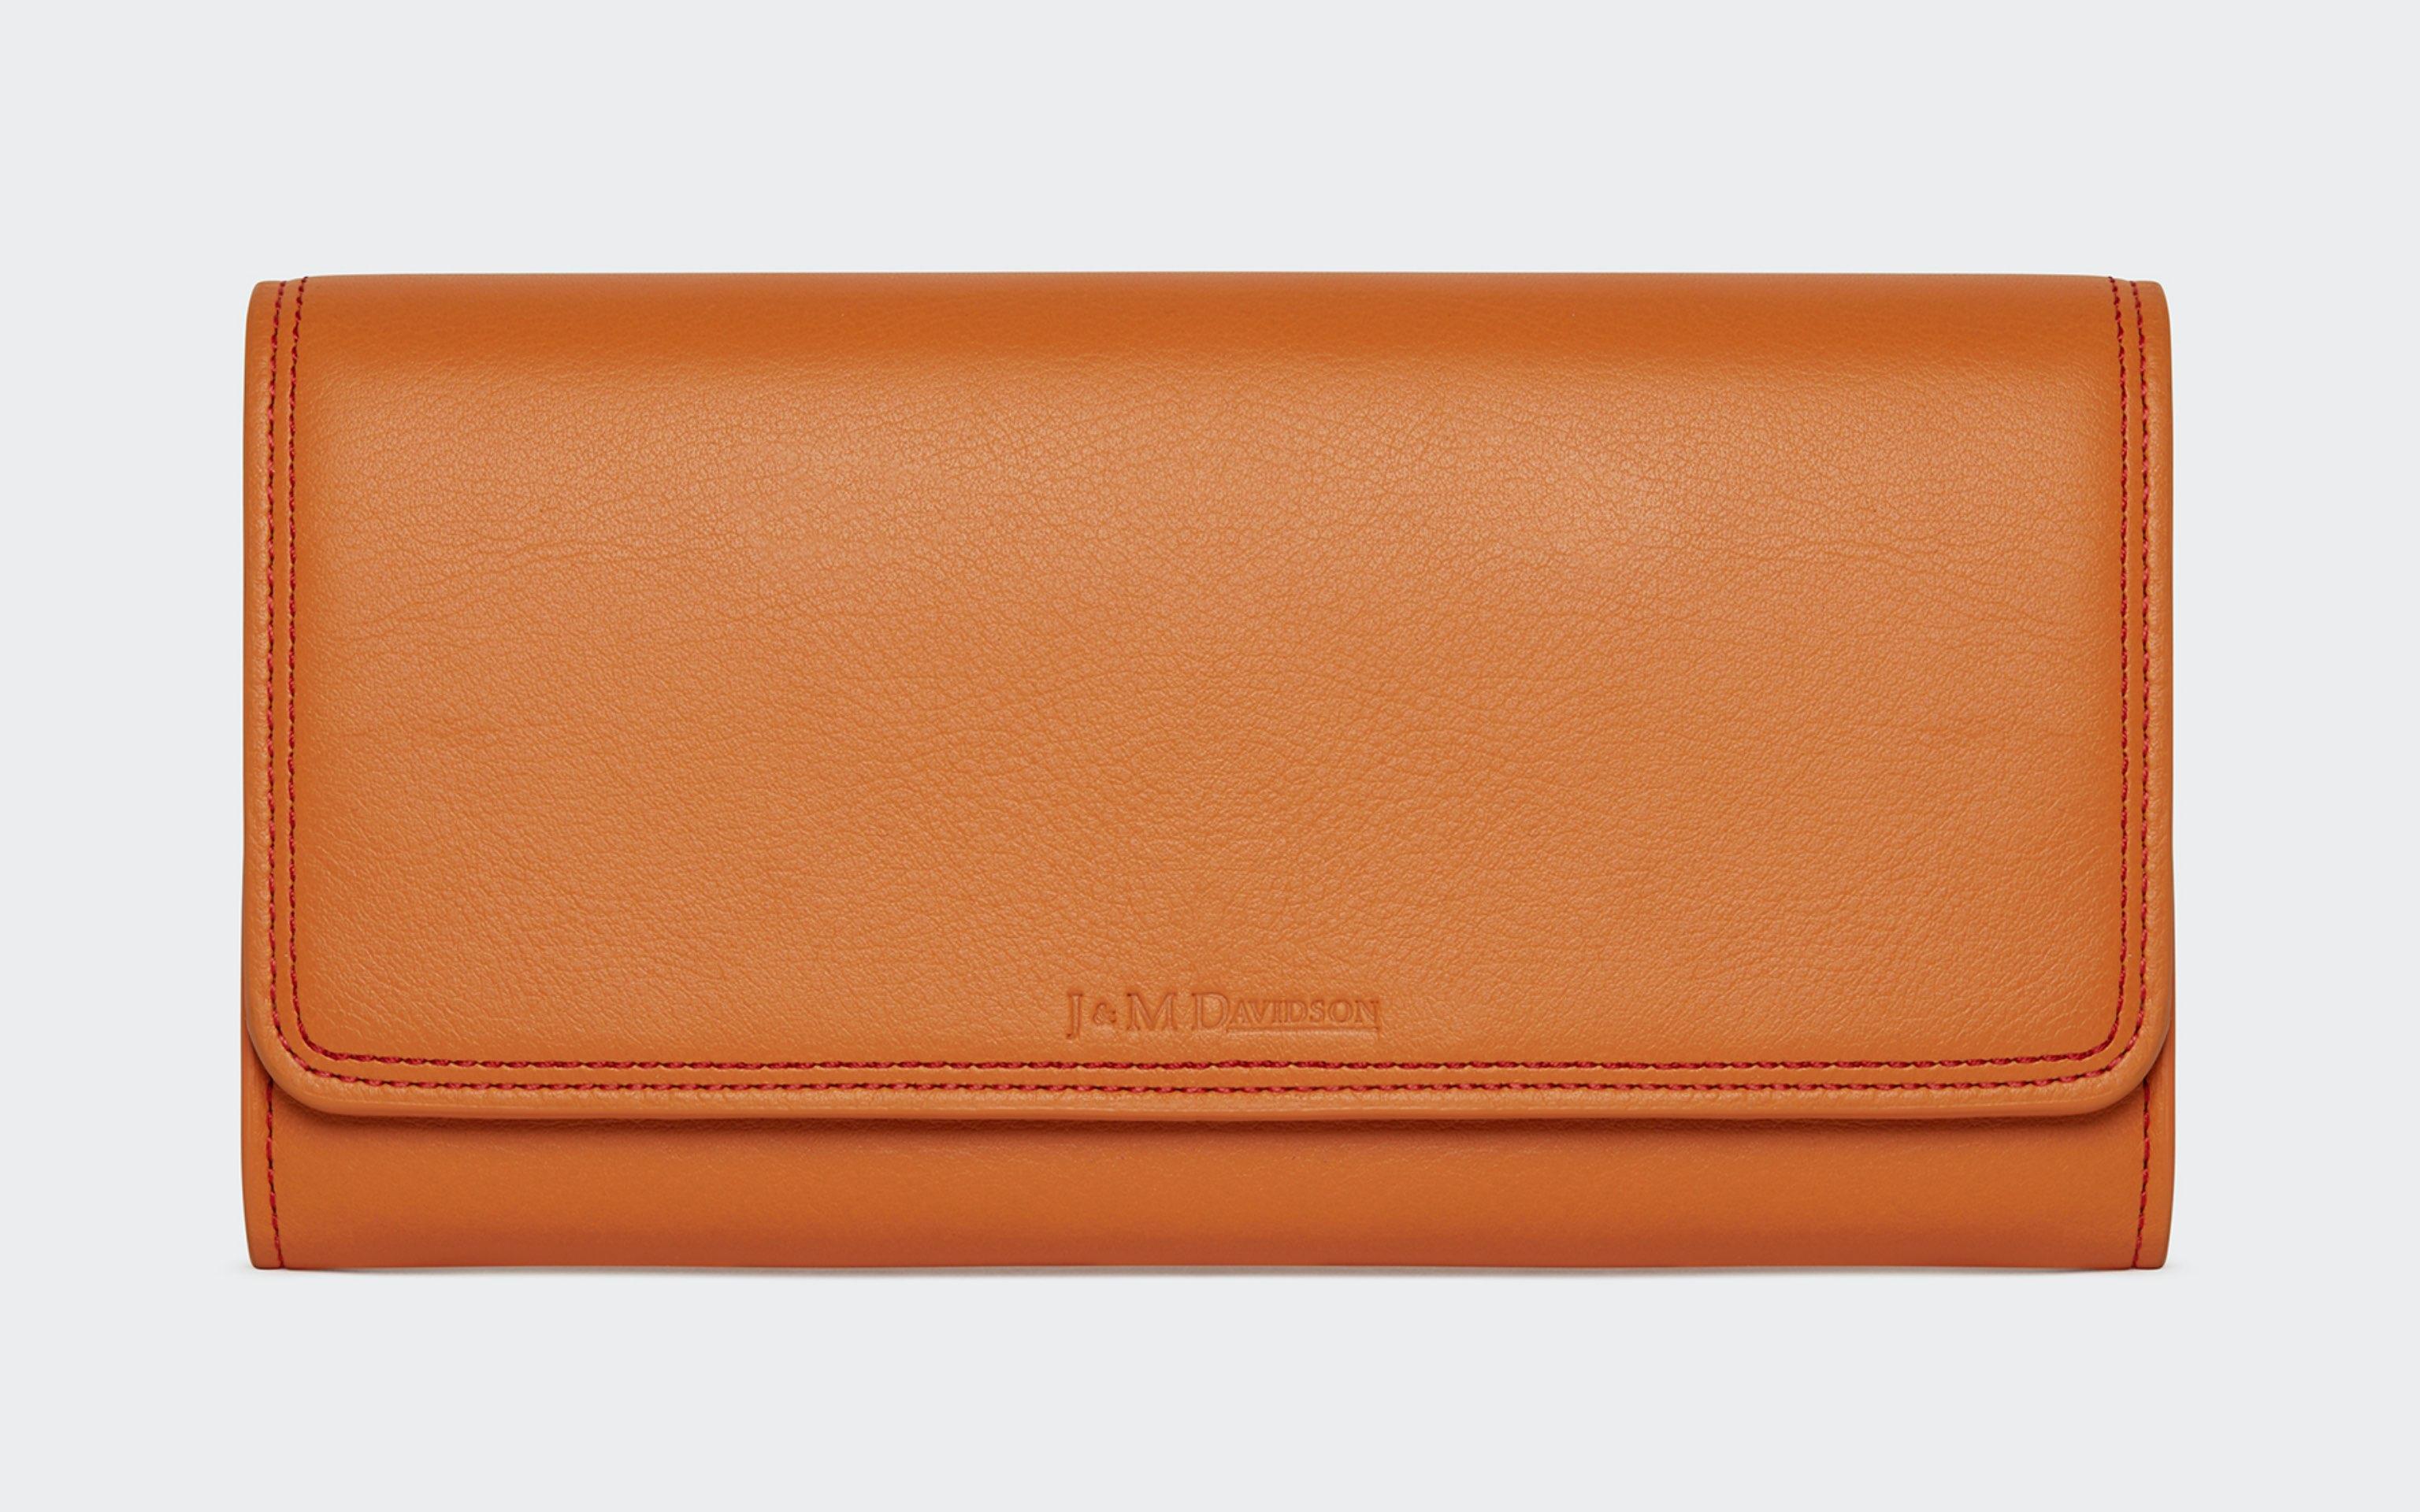 J&M light brown / orange leather square bag / purse